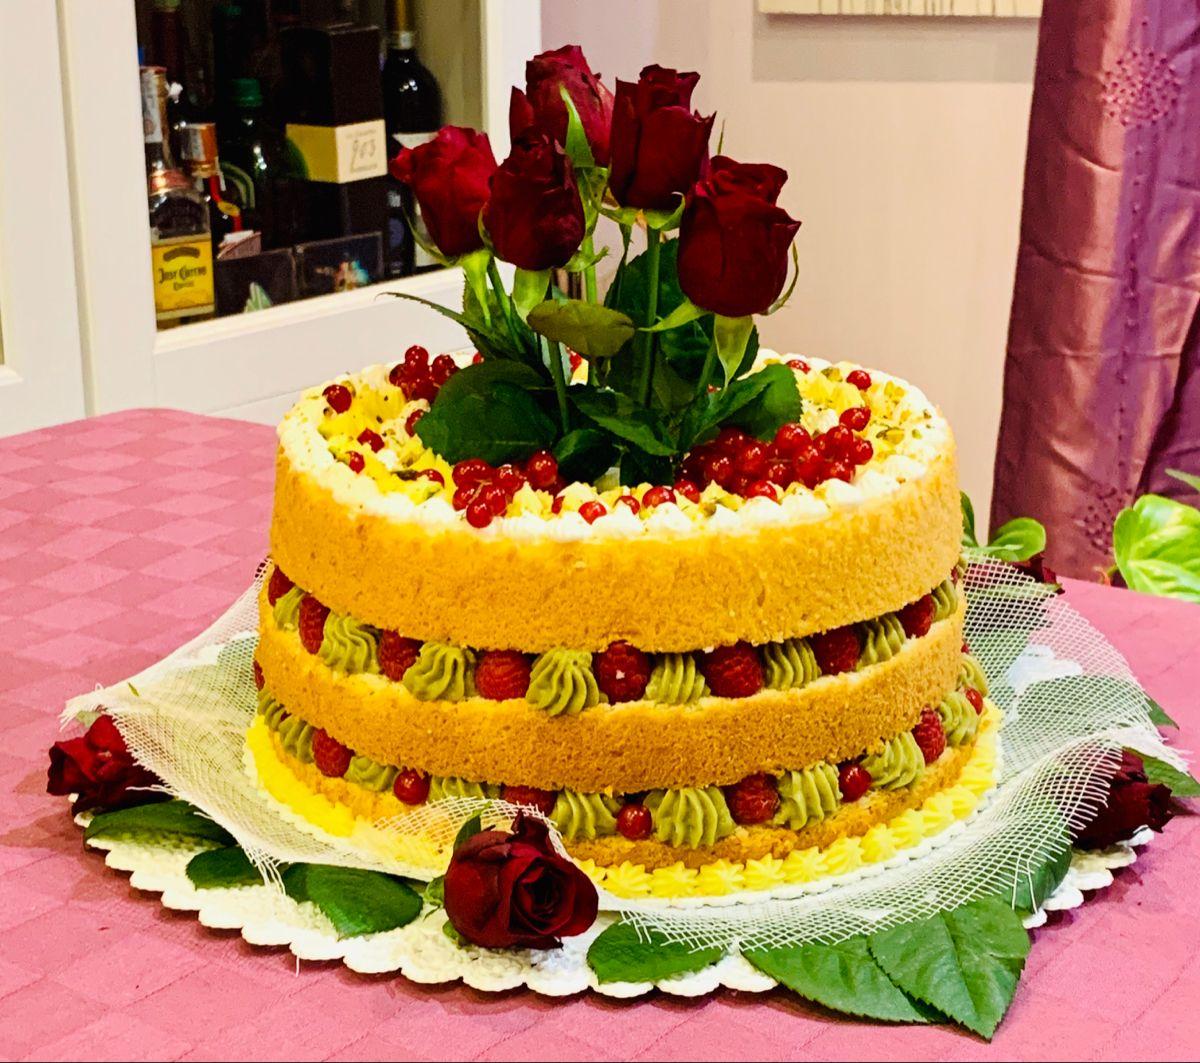 Naked cake Pan di Spagna, panna e fragole - Matilde Vicenzi